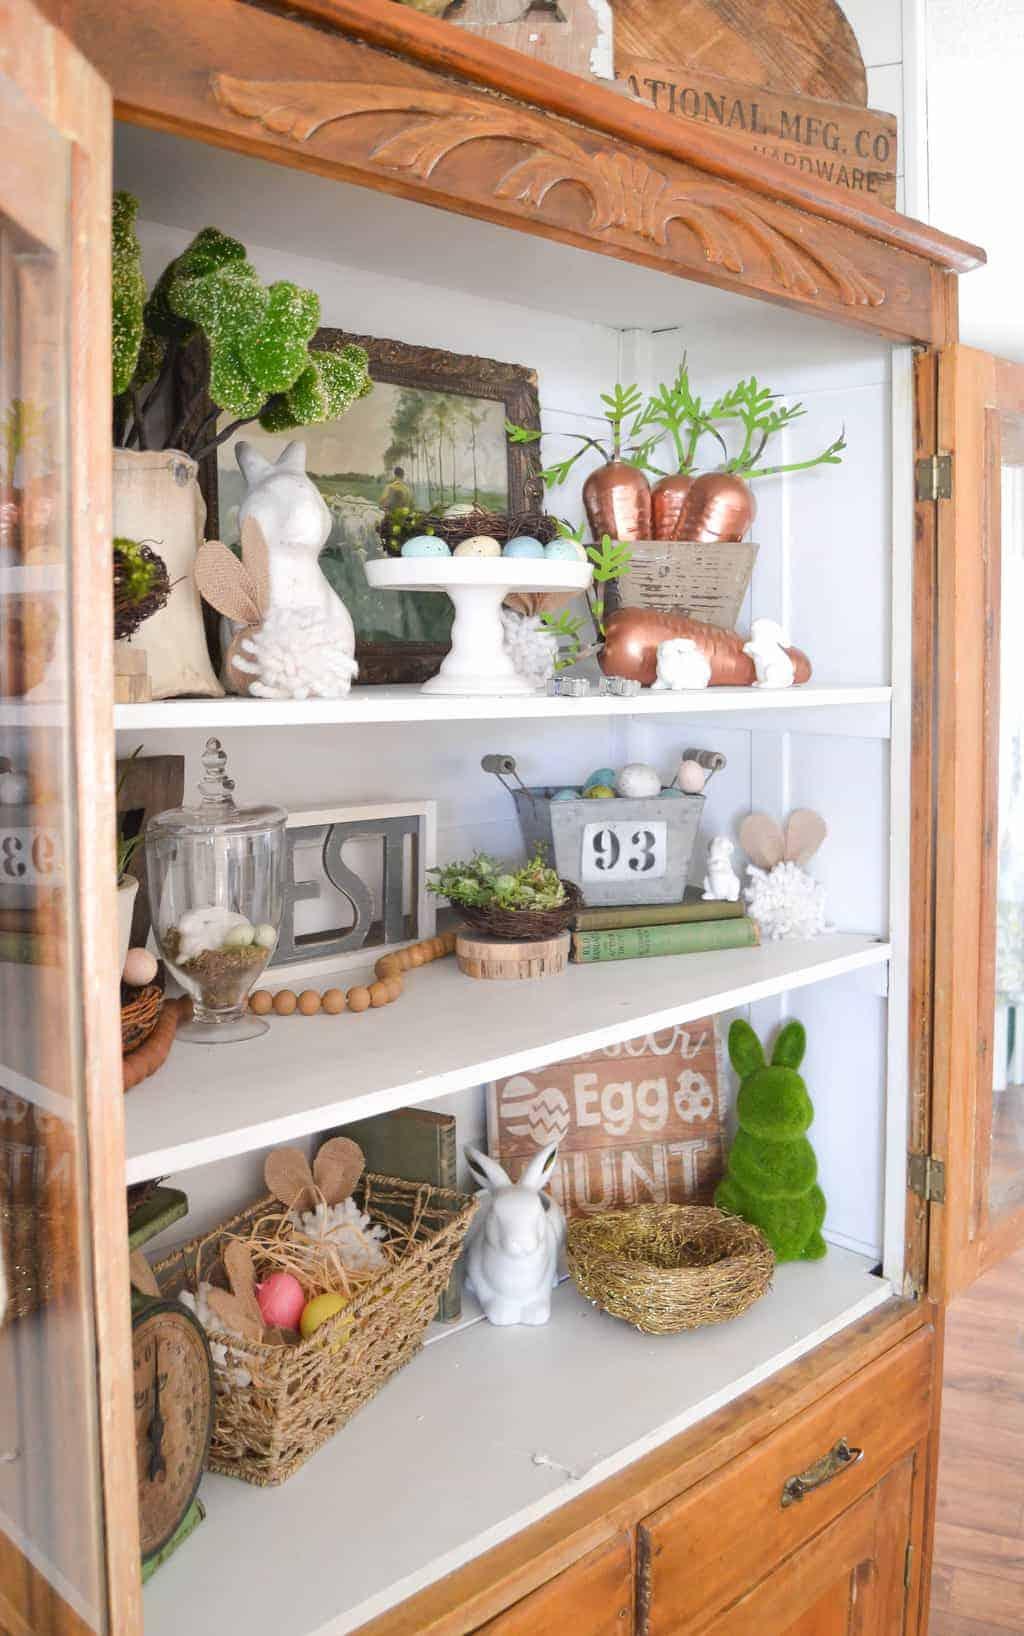 spring decor creative hutch porch days ways adding easy spent run down mycreativedays